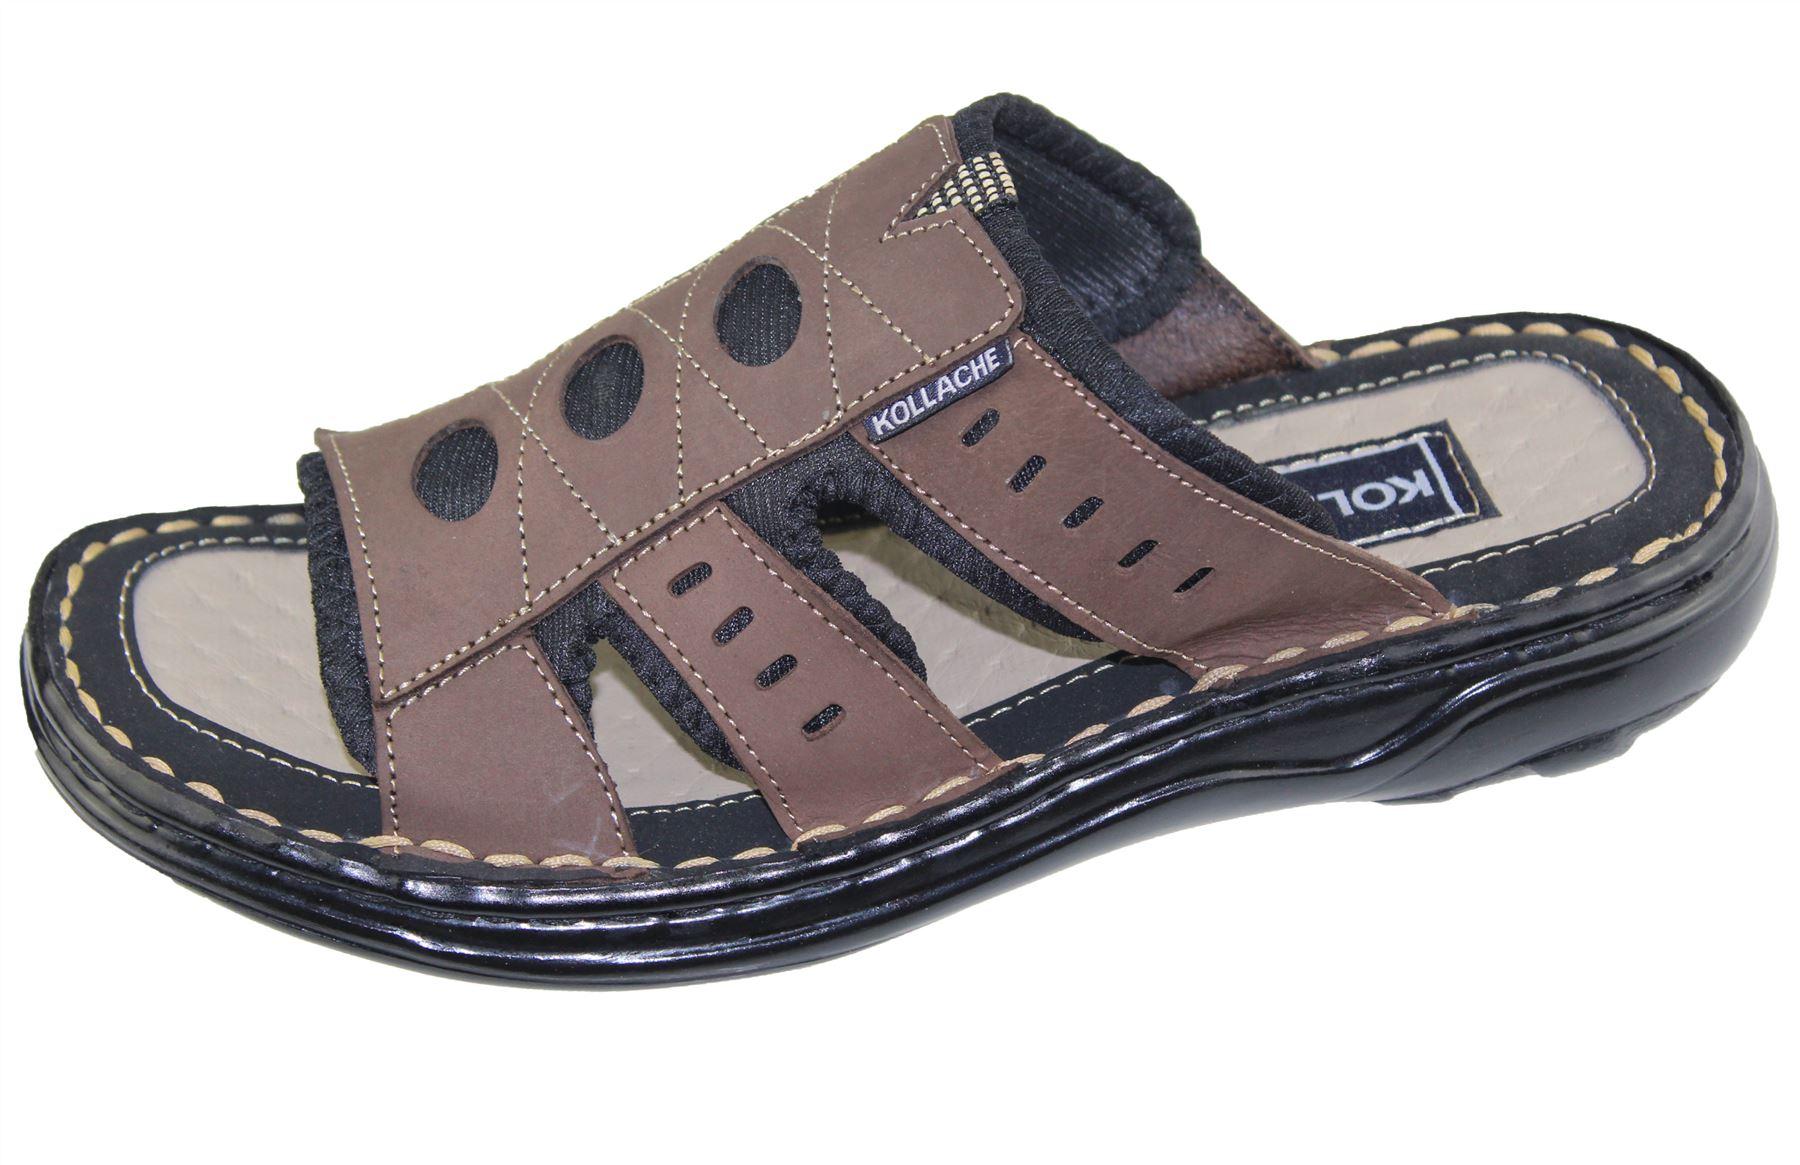 Mens-Slipper-Sandal-Sports-Beach-Buckle-Walking-Fashion-Summer-Casual-Shoes-Size miniatura 23